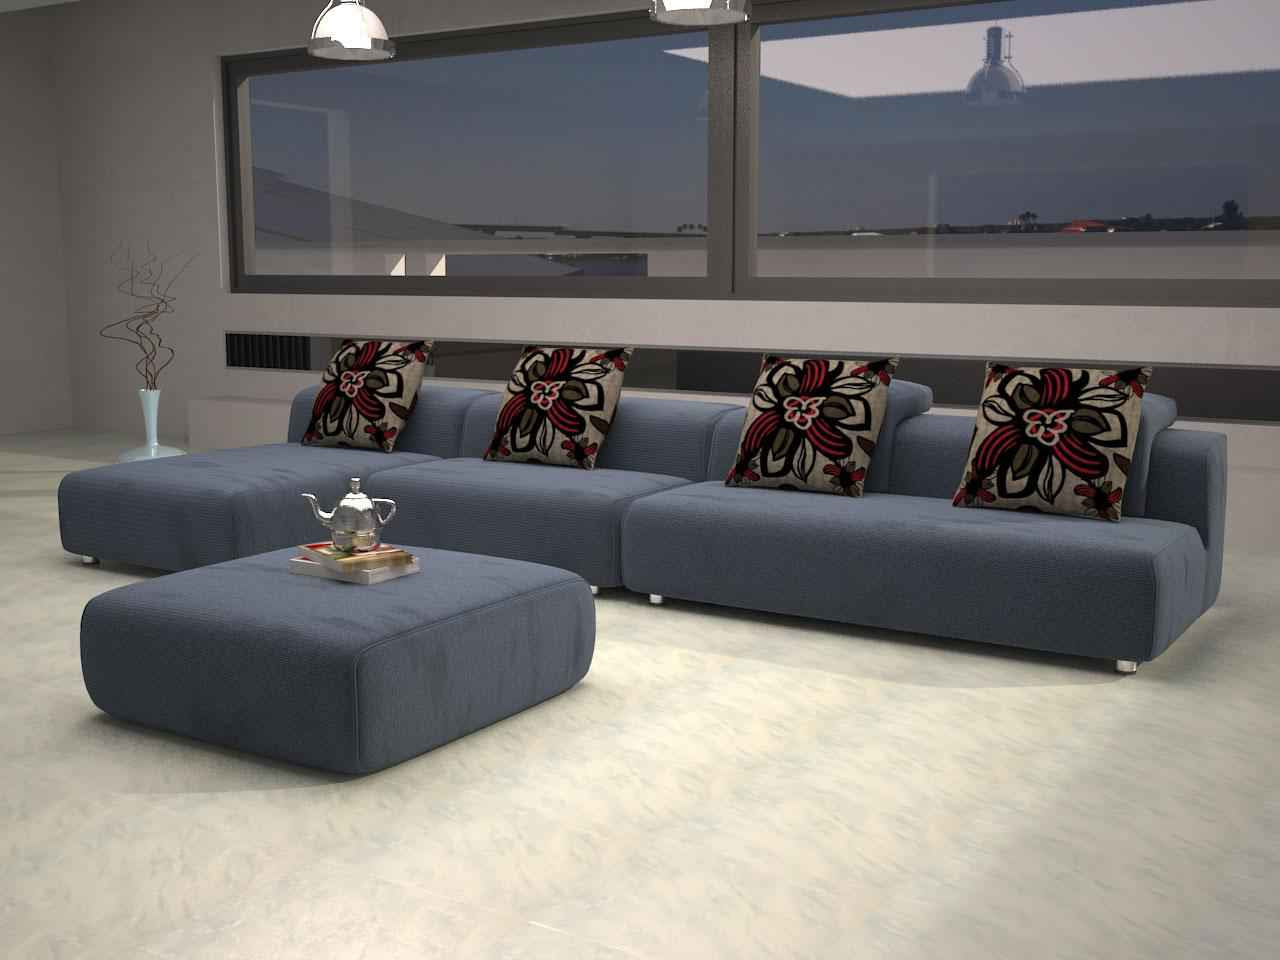 Elegant Cheap Home Decor Ideas Porentreospingosdechuva